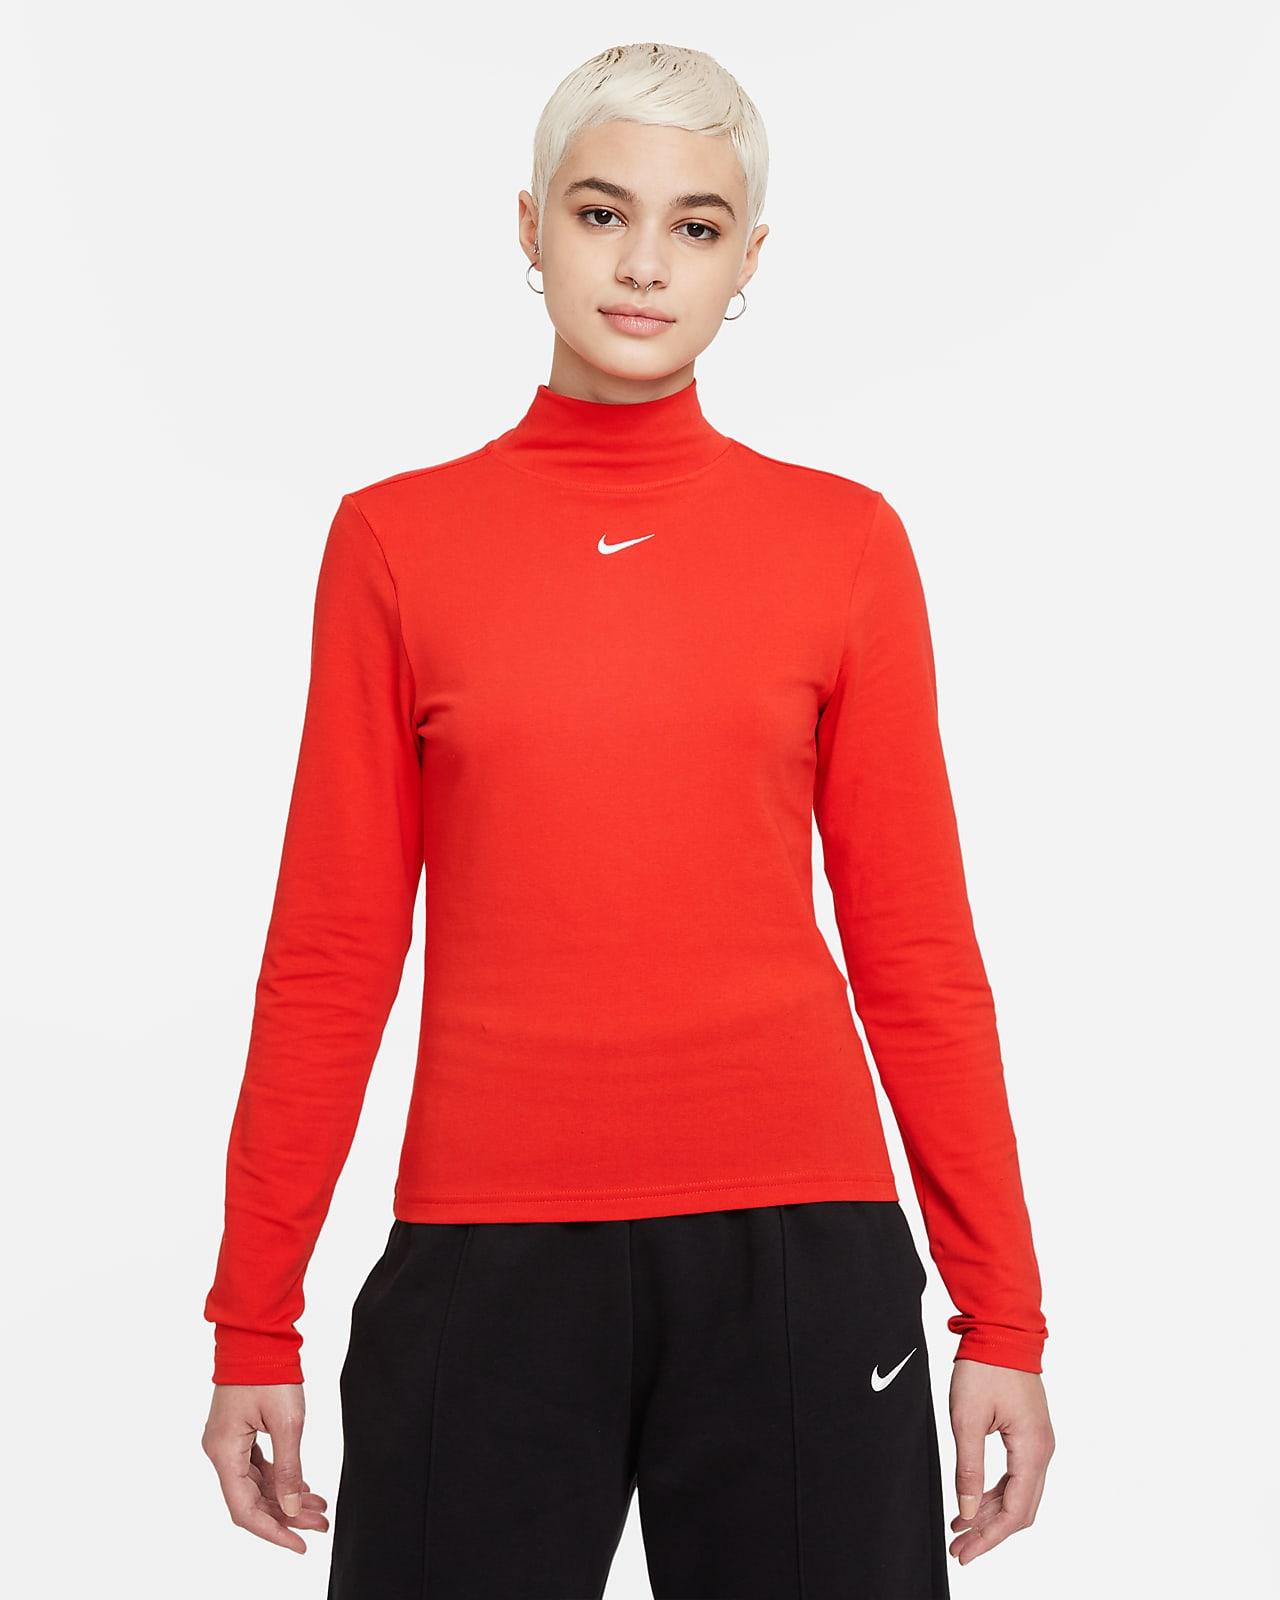 Nike Sportswear Collection Essentials Women's Long-Sleeve Mock Top